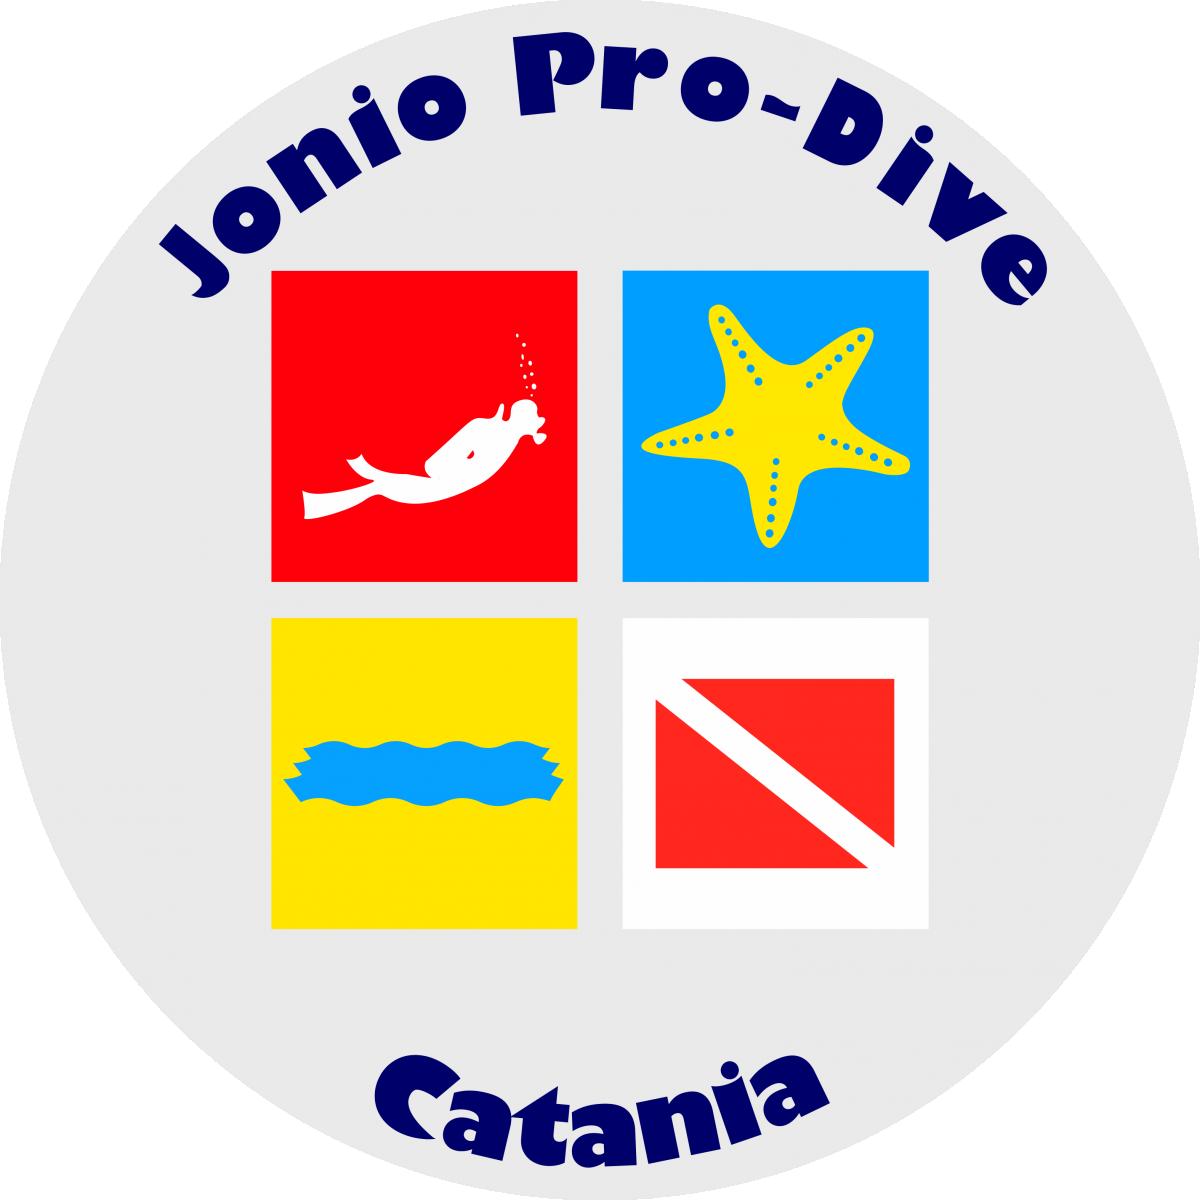 Jonio Pro-Dive Catania